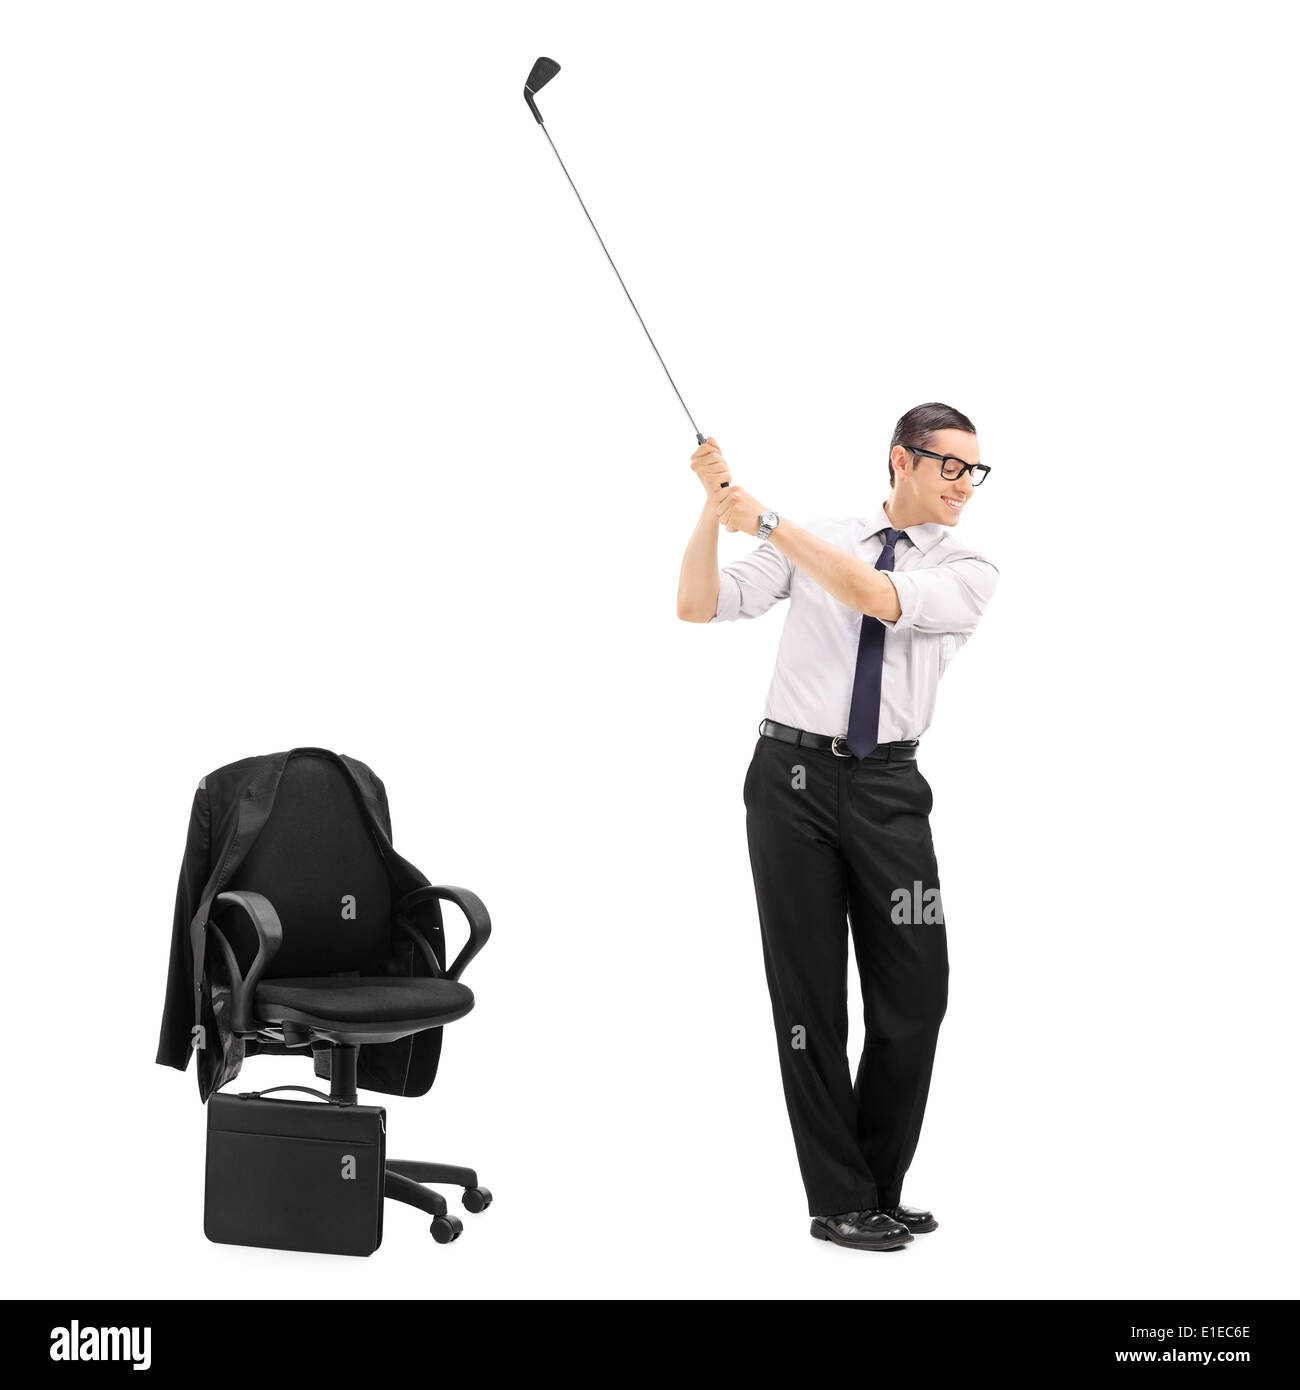 Businessman swinging a golf club with an office chair beside him  sc 1 st  Alamy & Businessman swinging a golf club with an office chair beside him ...